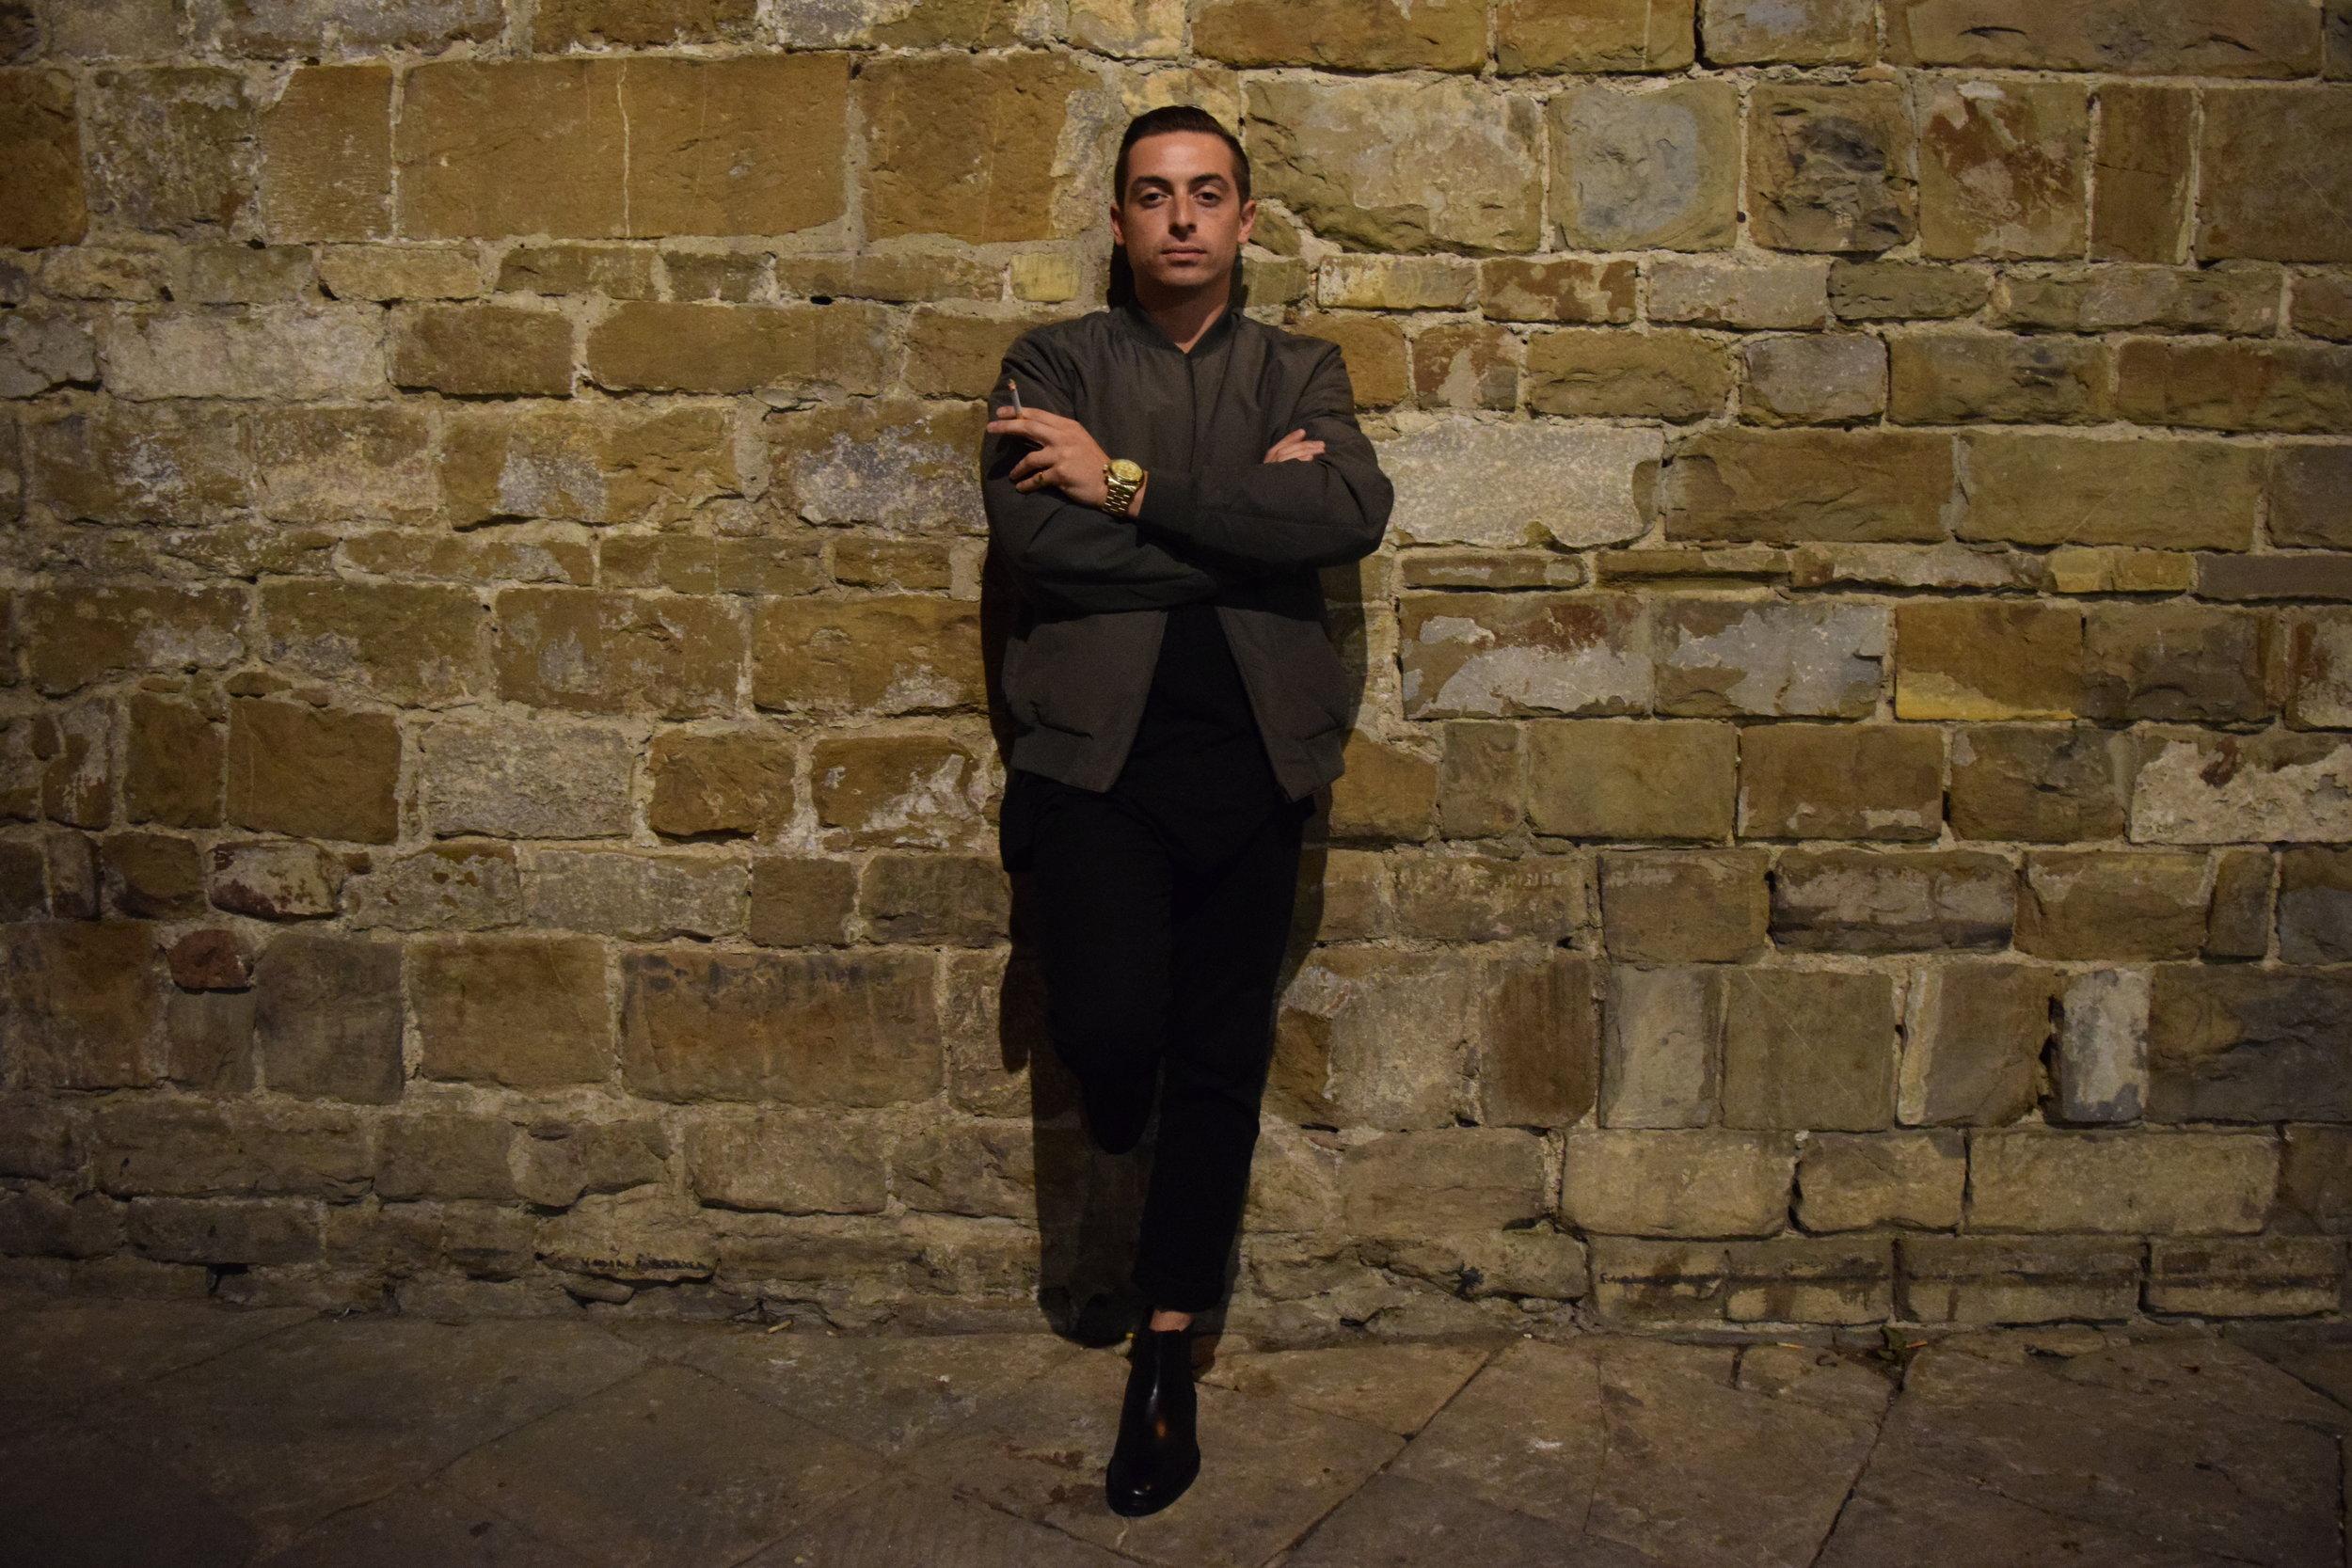 McGonagle_Portraits03.JPG